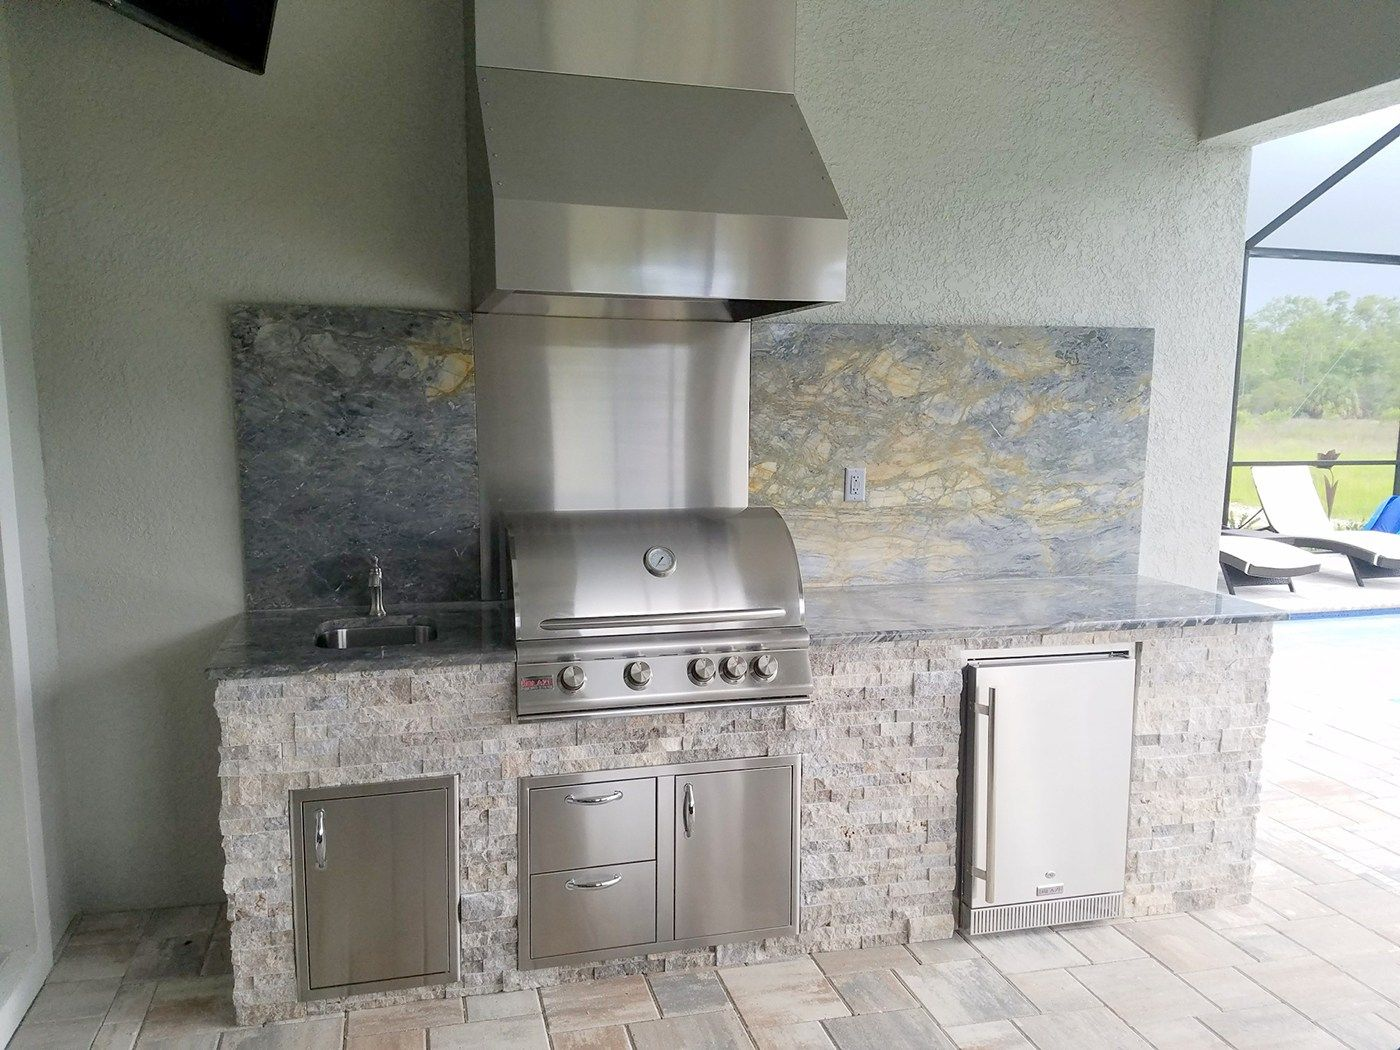 Arabescatus Oro Custom Outdoor Kitchen Summer Kitchen Barbecue Grill Outdoor